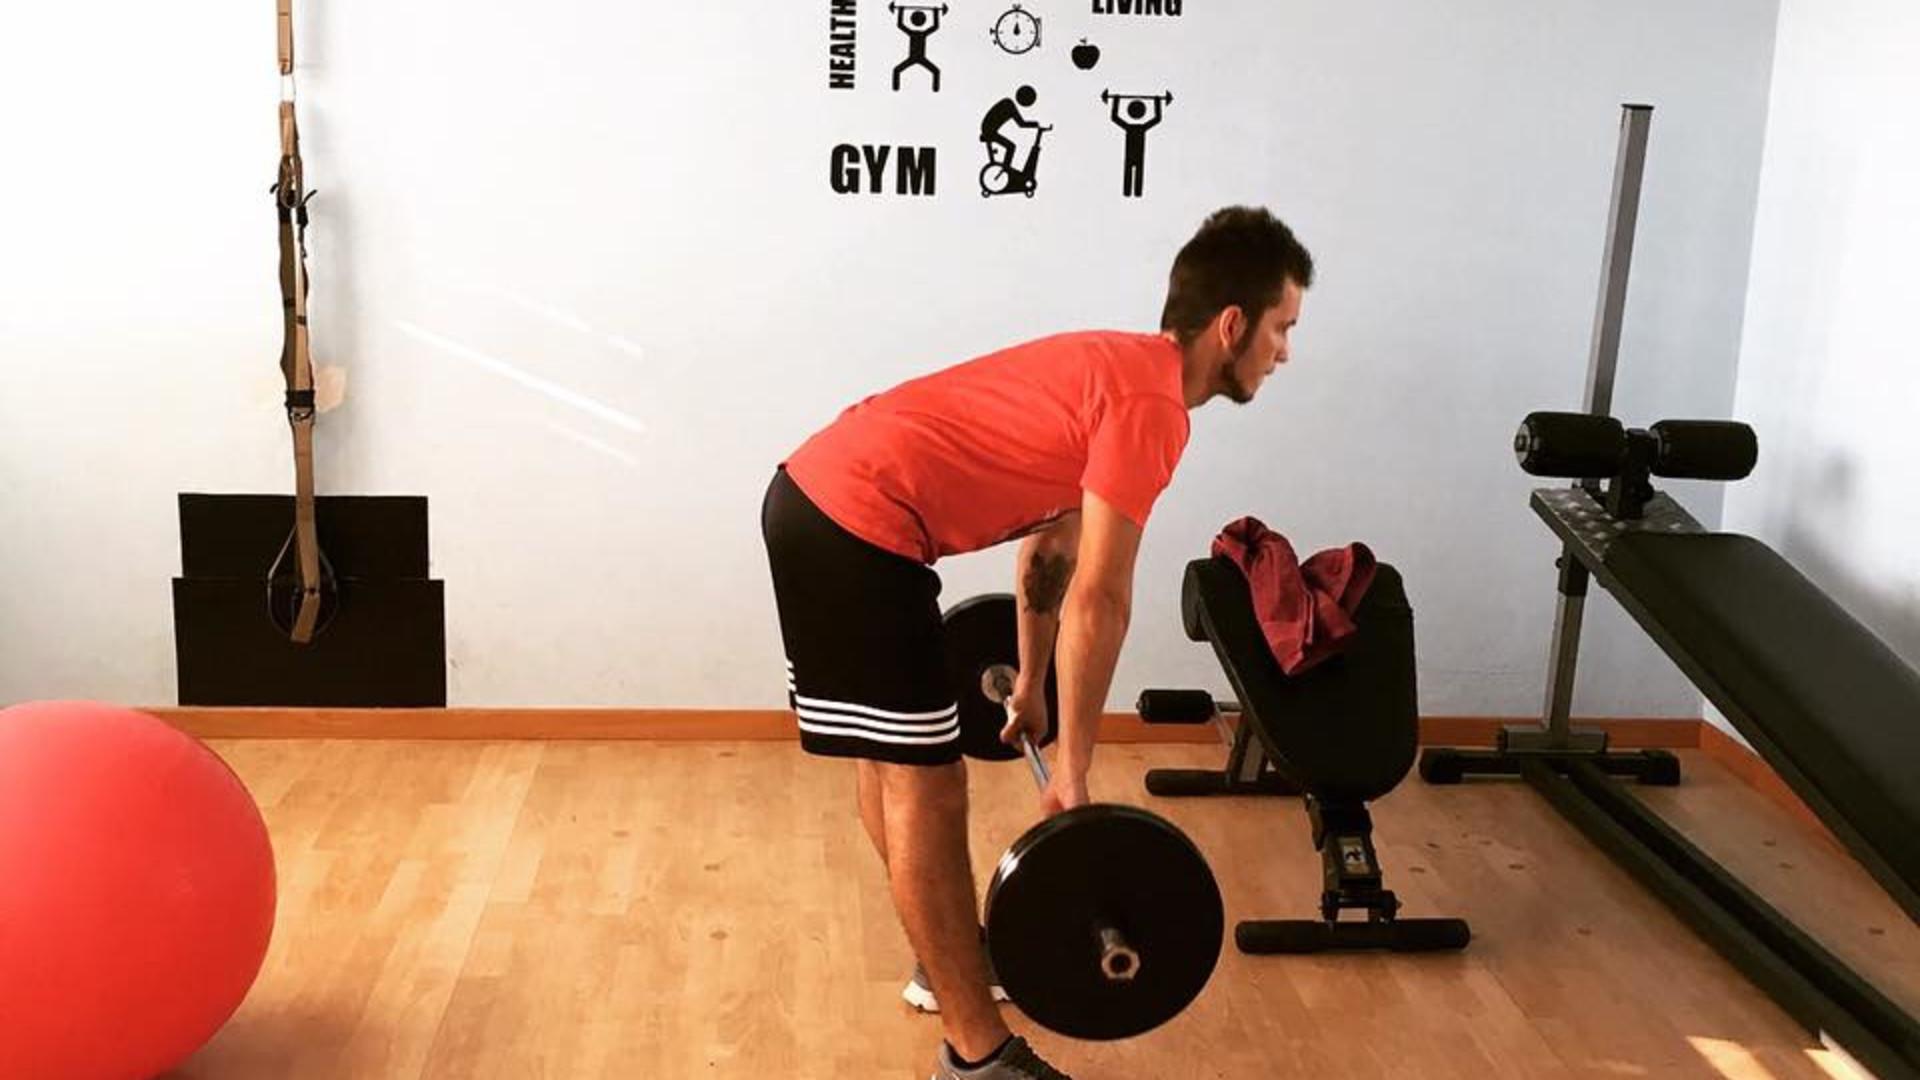 TM Gym Fitness Suno